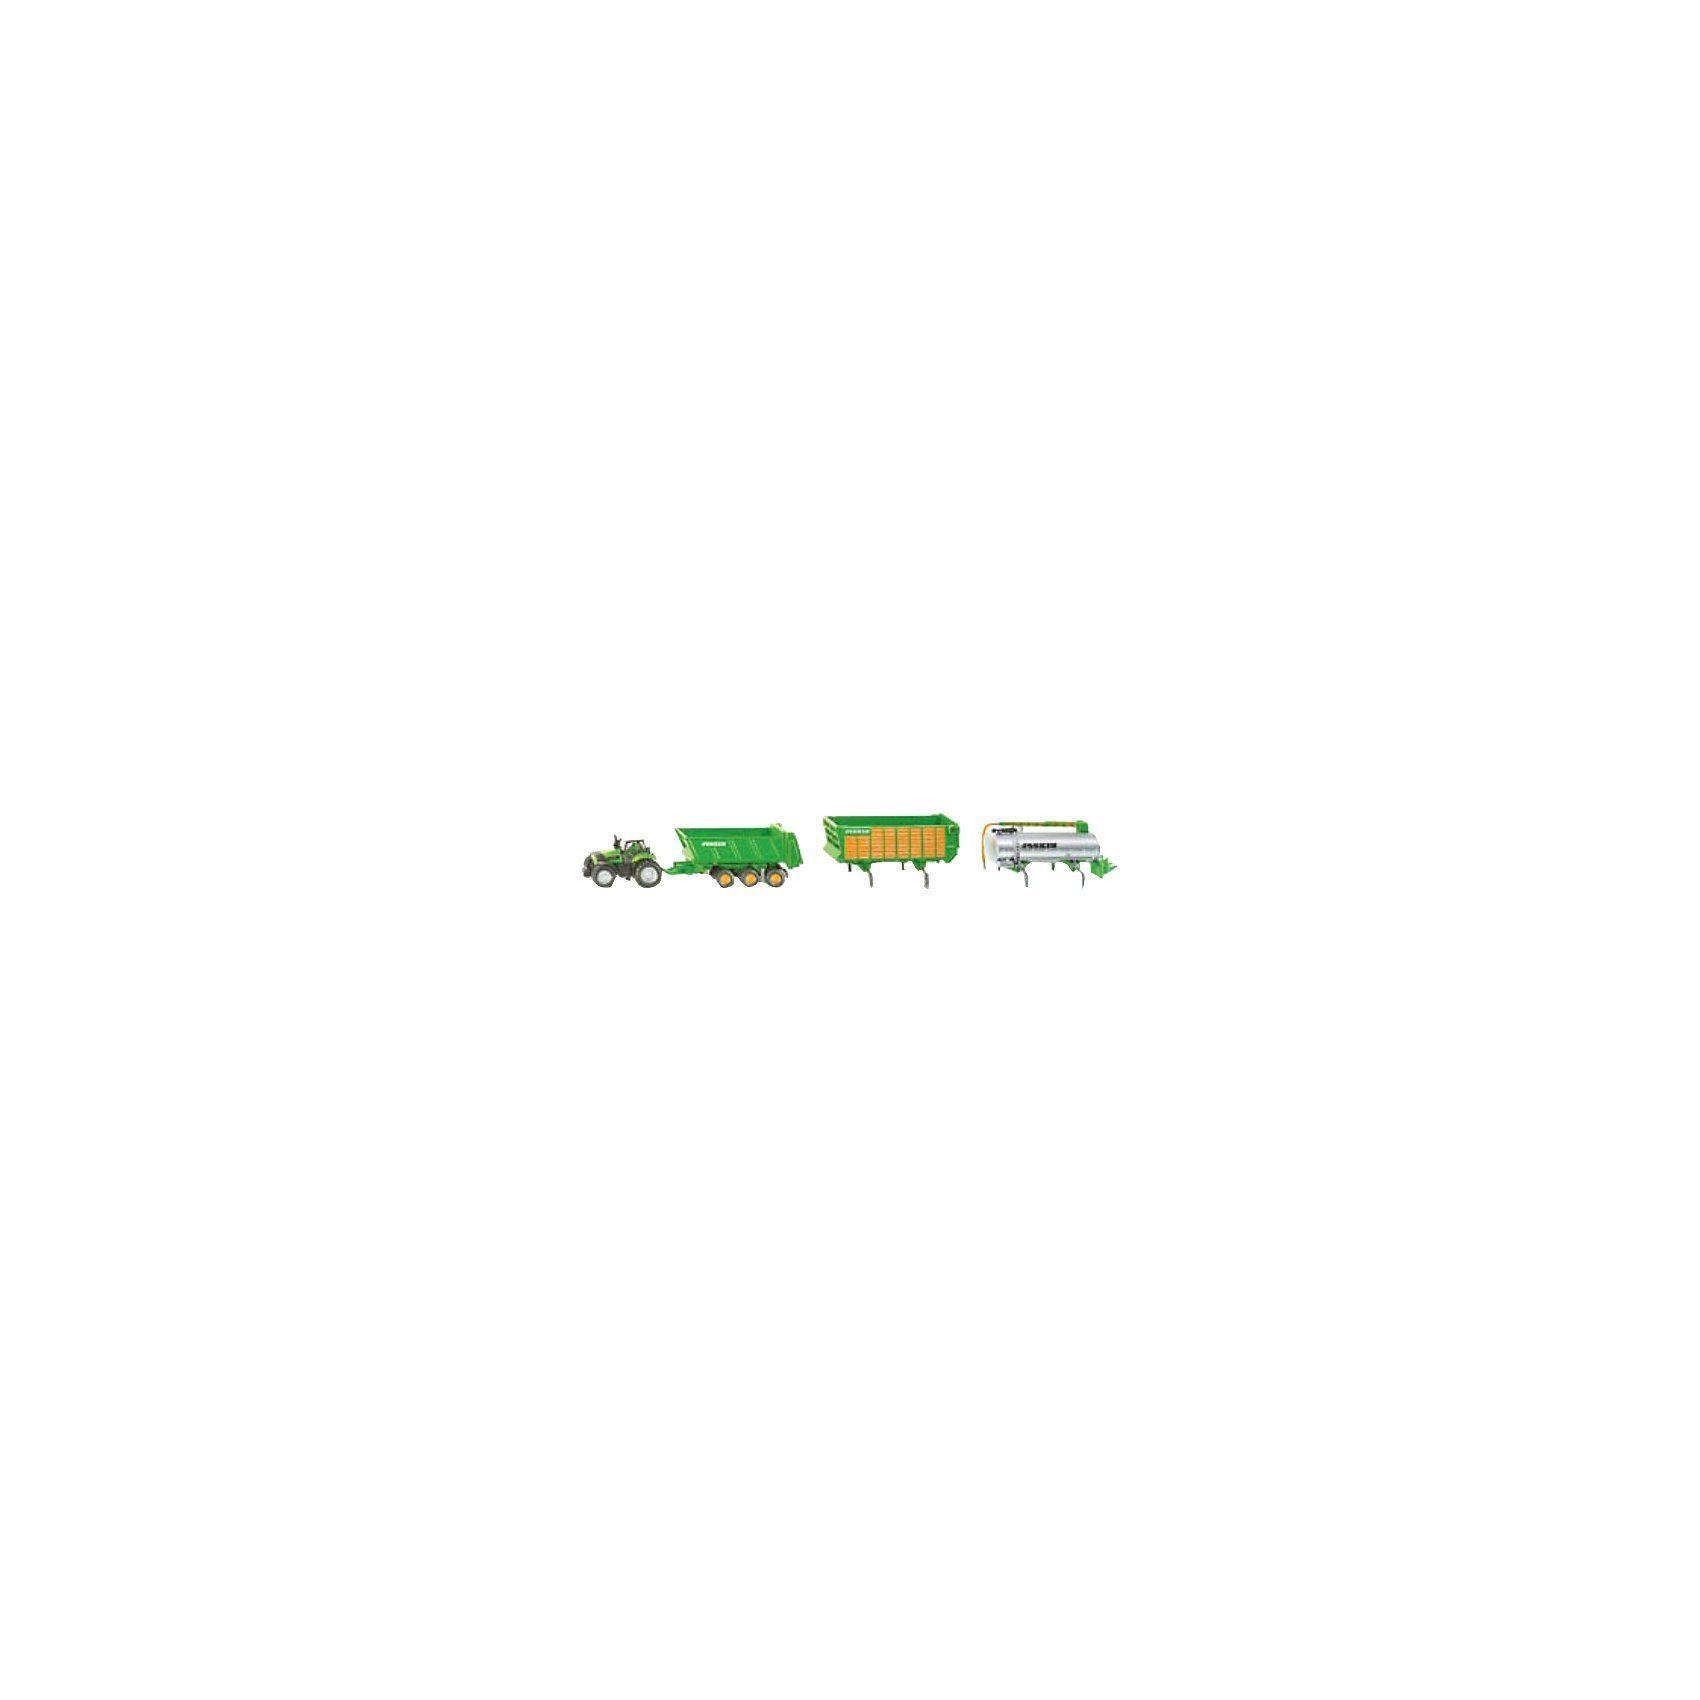 SIKU 1848 DEUTZ Traktor mit Joskin Anhängerset 1:87